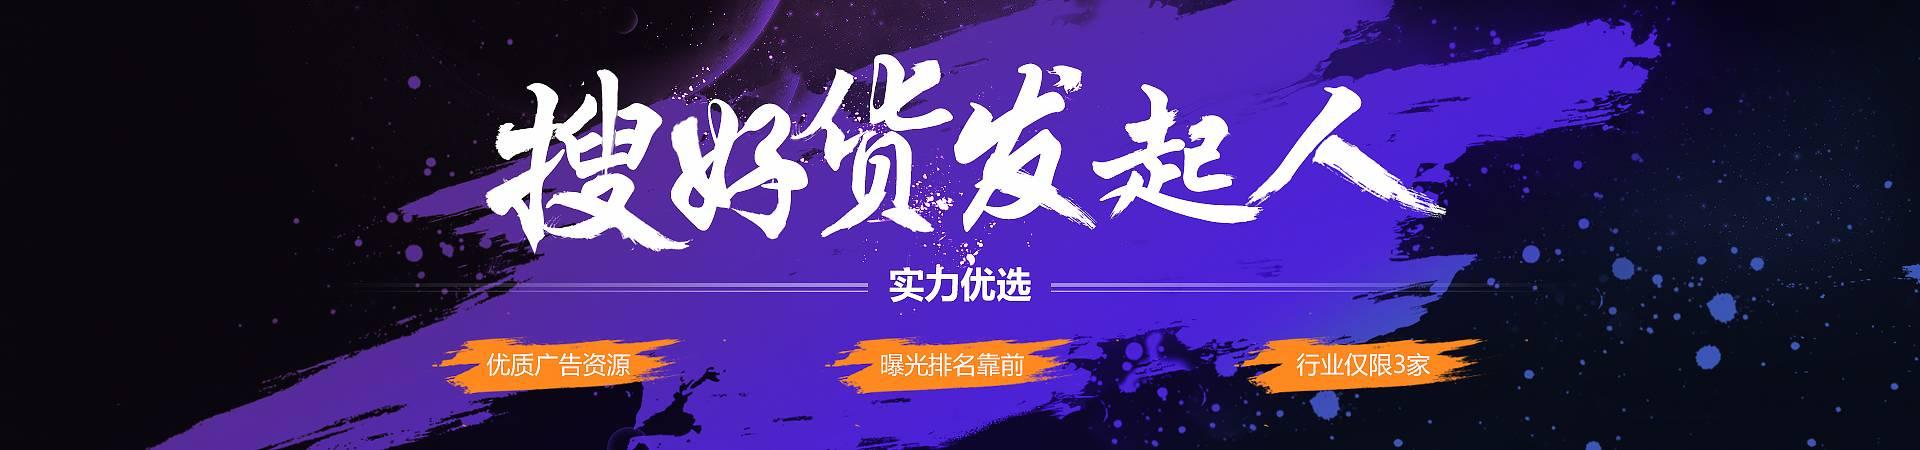 X42螺旋鋼管加強級3pe防腐 3pe防腐埋地管道 滄州市海威鋼管圖片